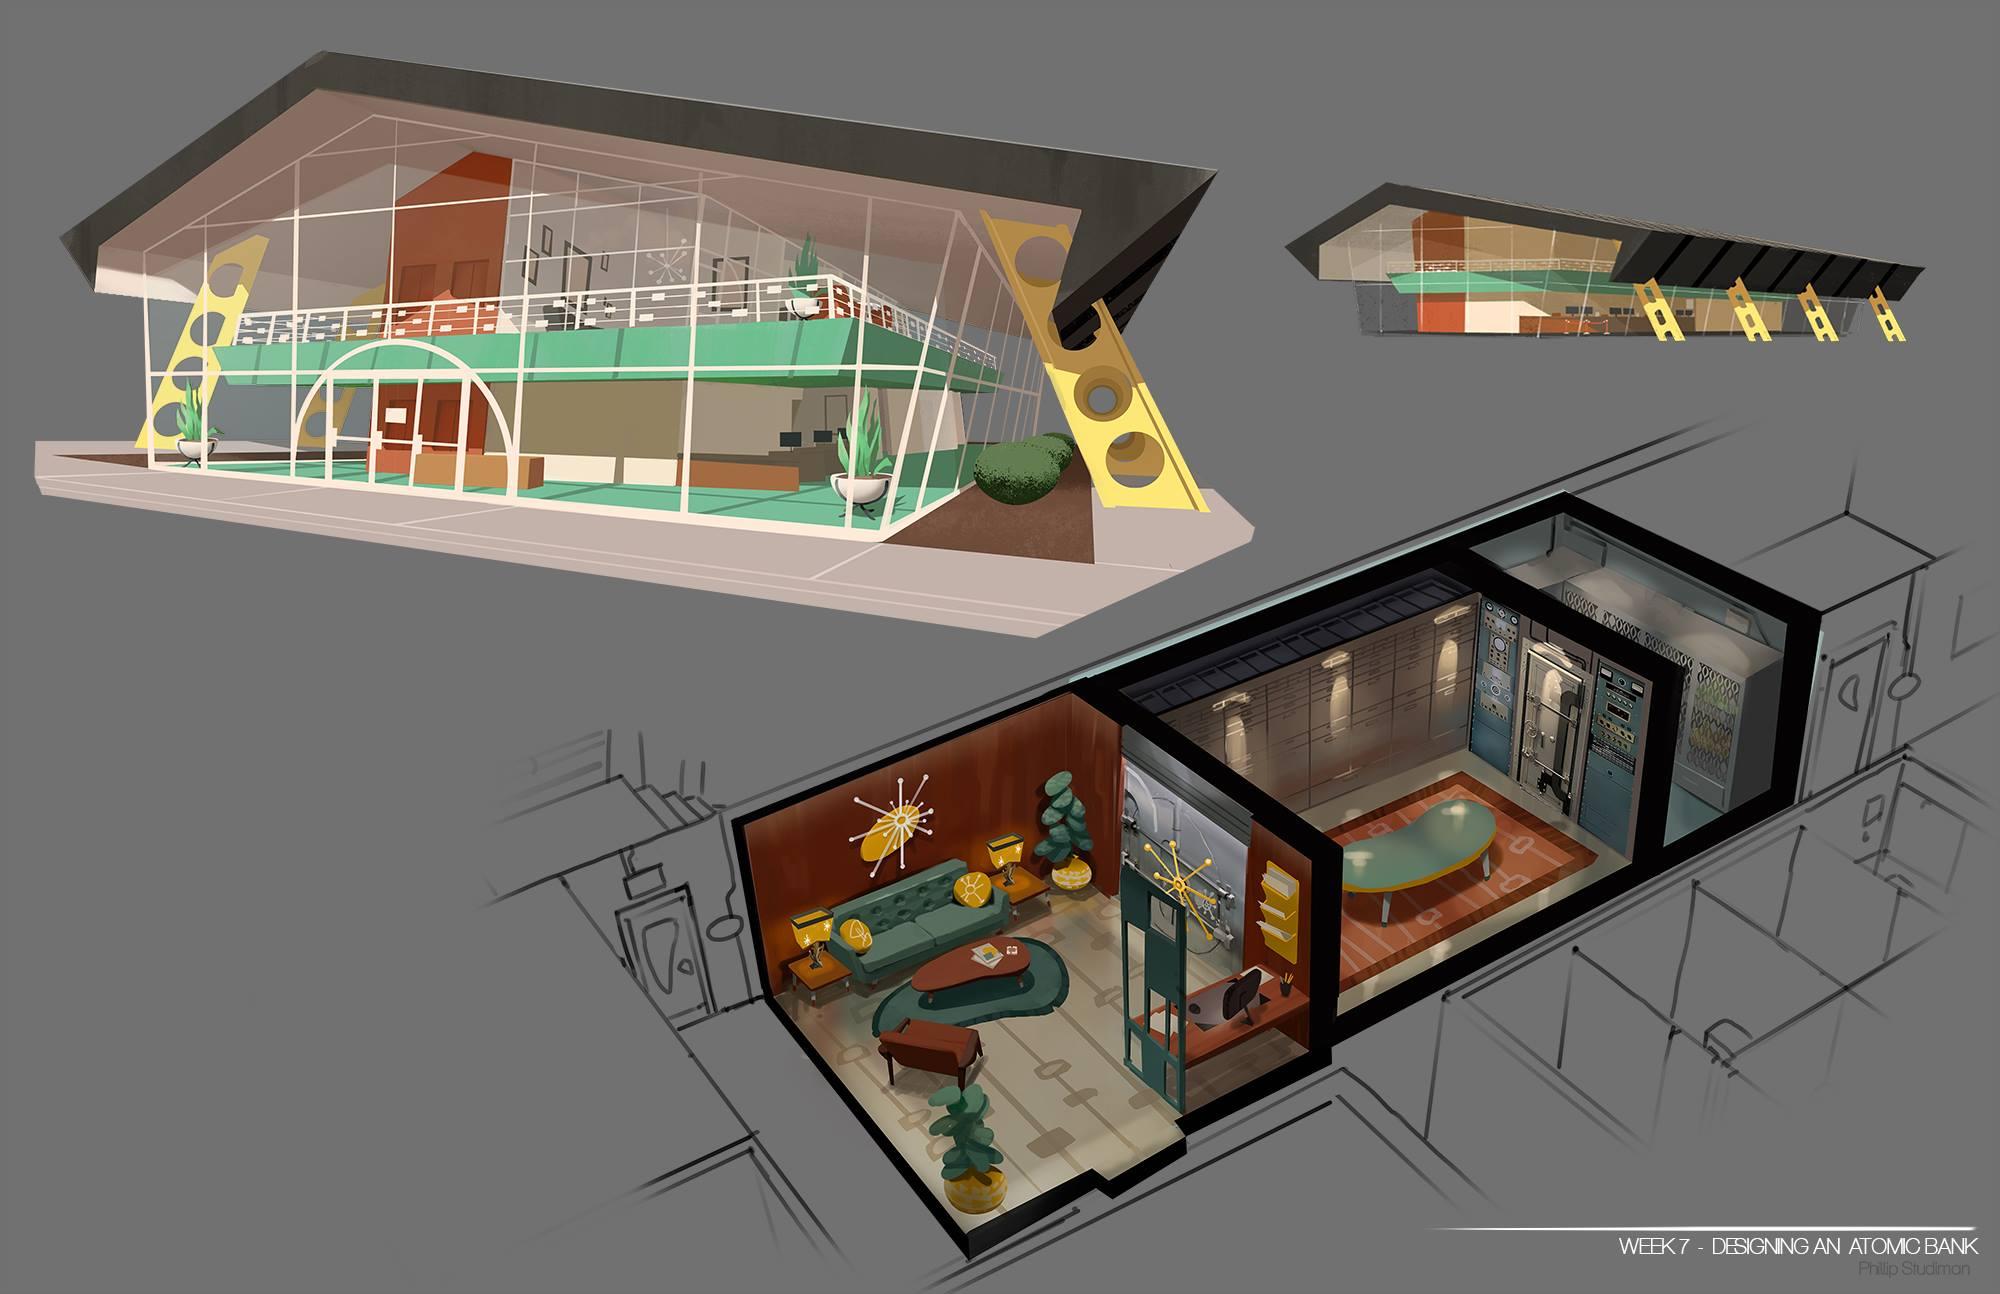 Design by Philip Studman